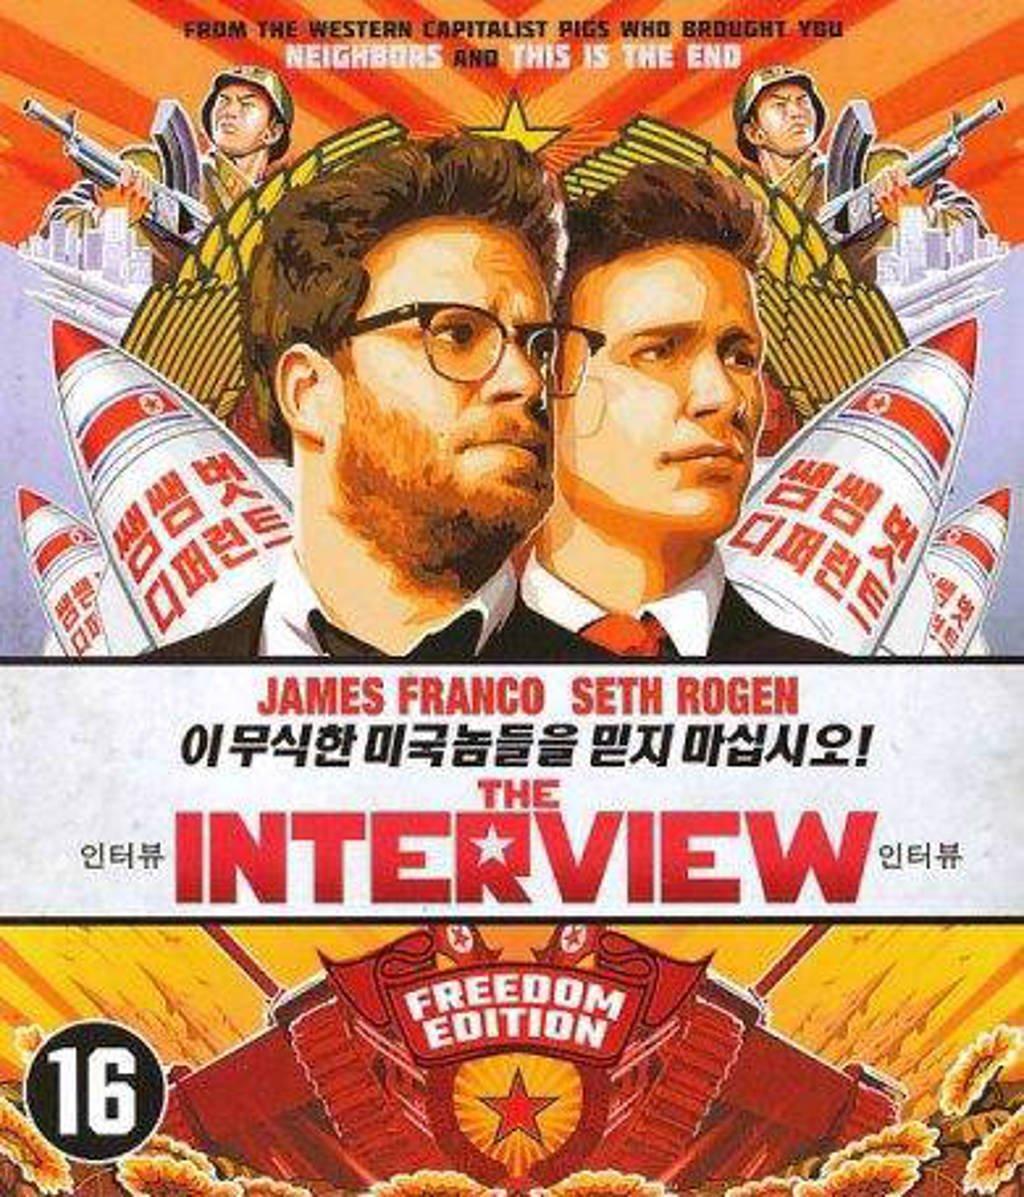 Interview (Blu-ray)